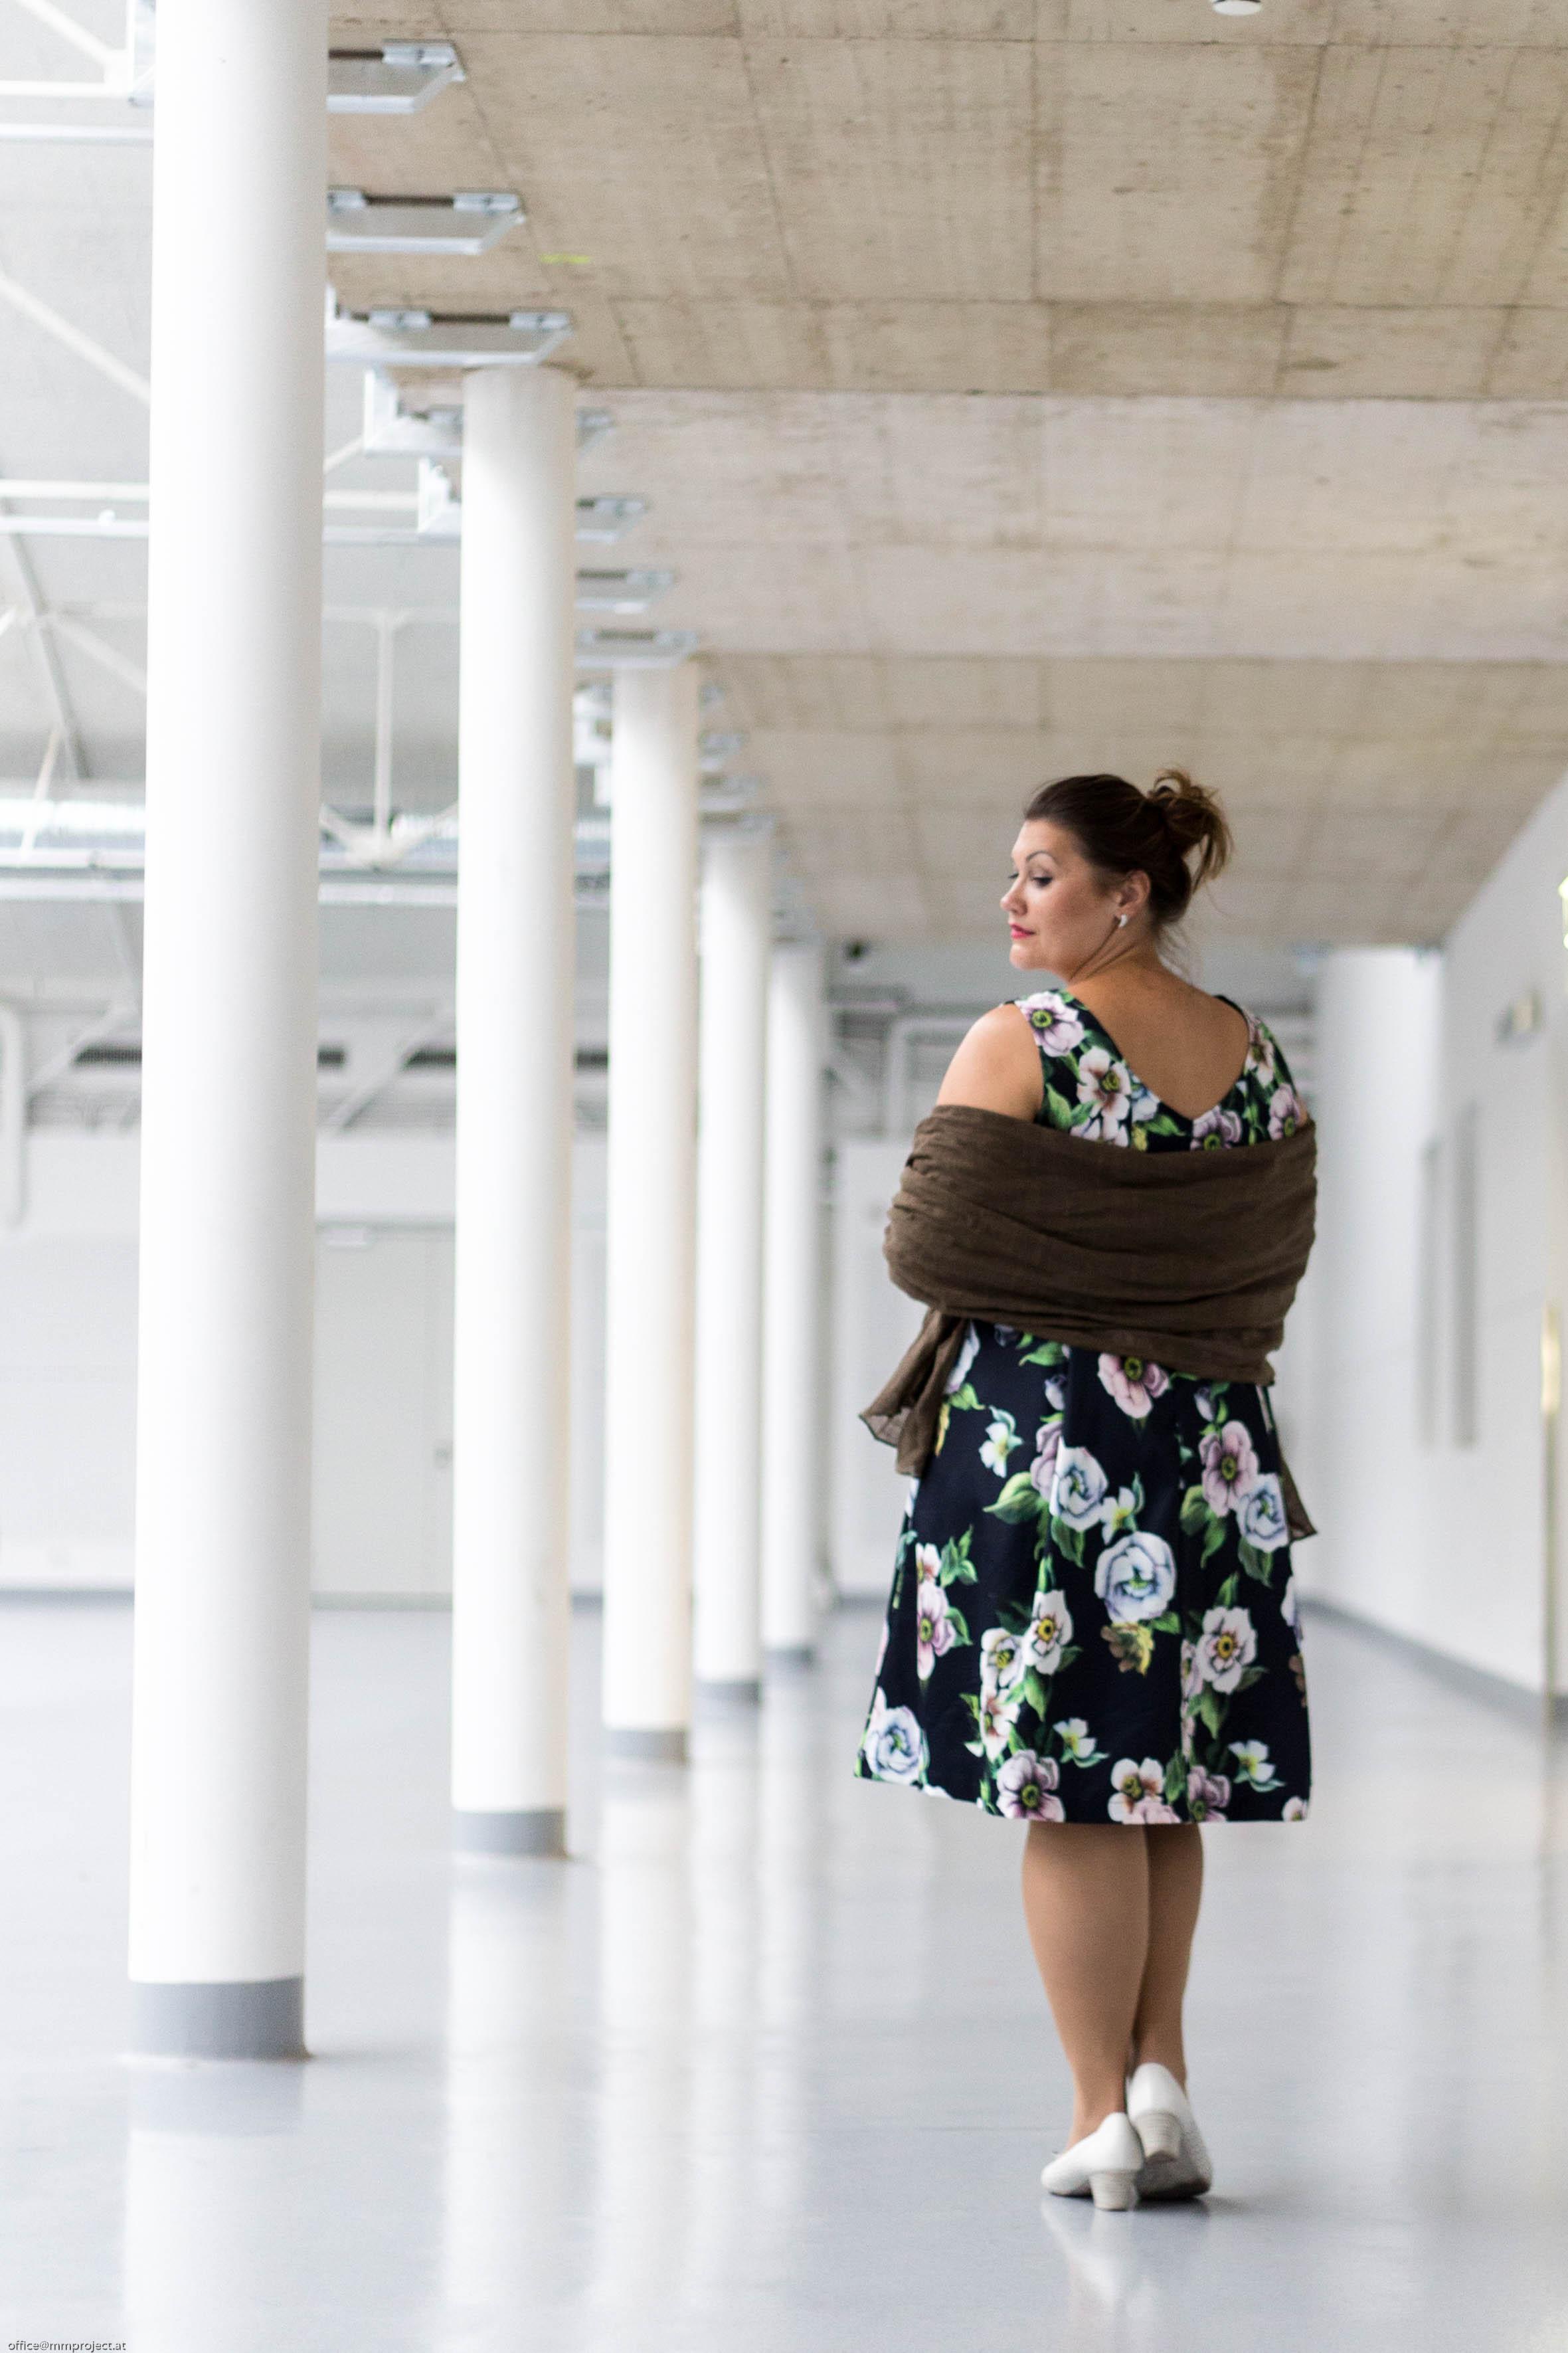 kardiaserena rockabilly style elegant zizzi fashion plus size fashion blumenprint flowerprint schal